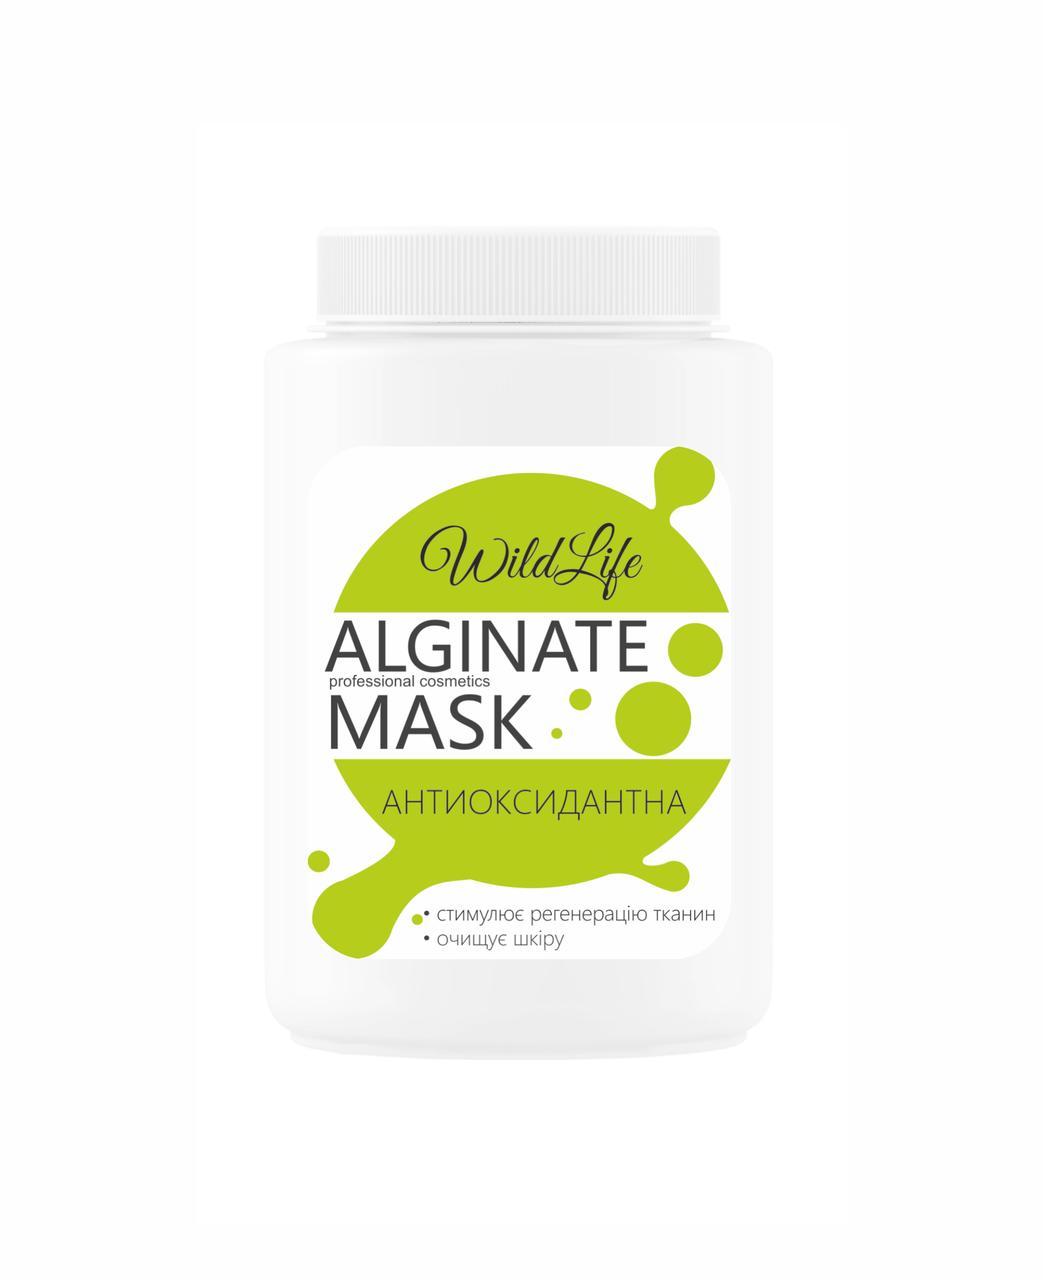 Альгінатна маска антиоксидантна 180 р. WildLife